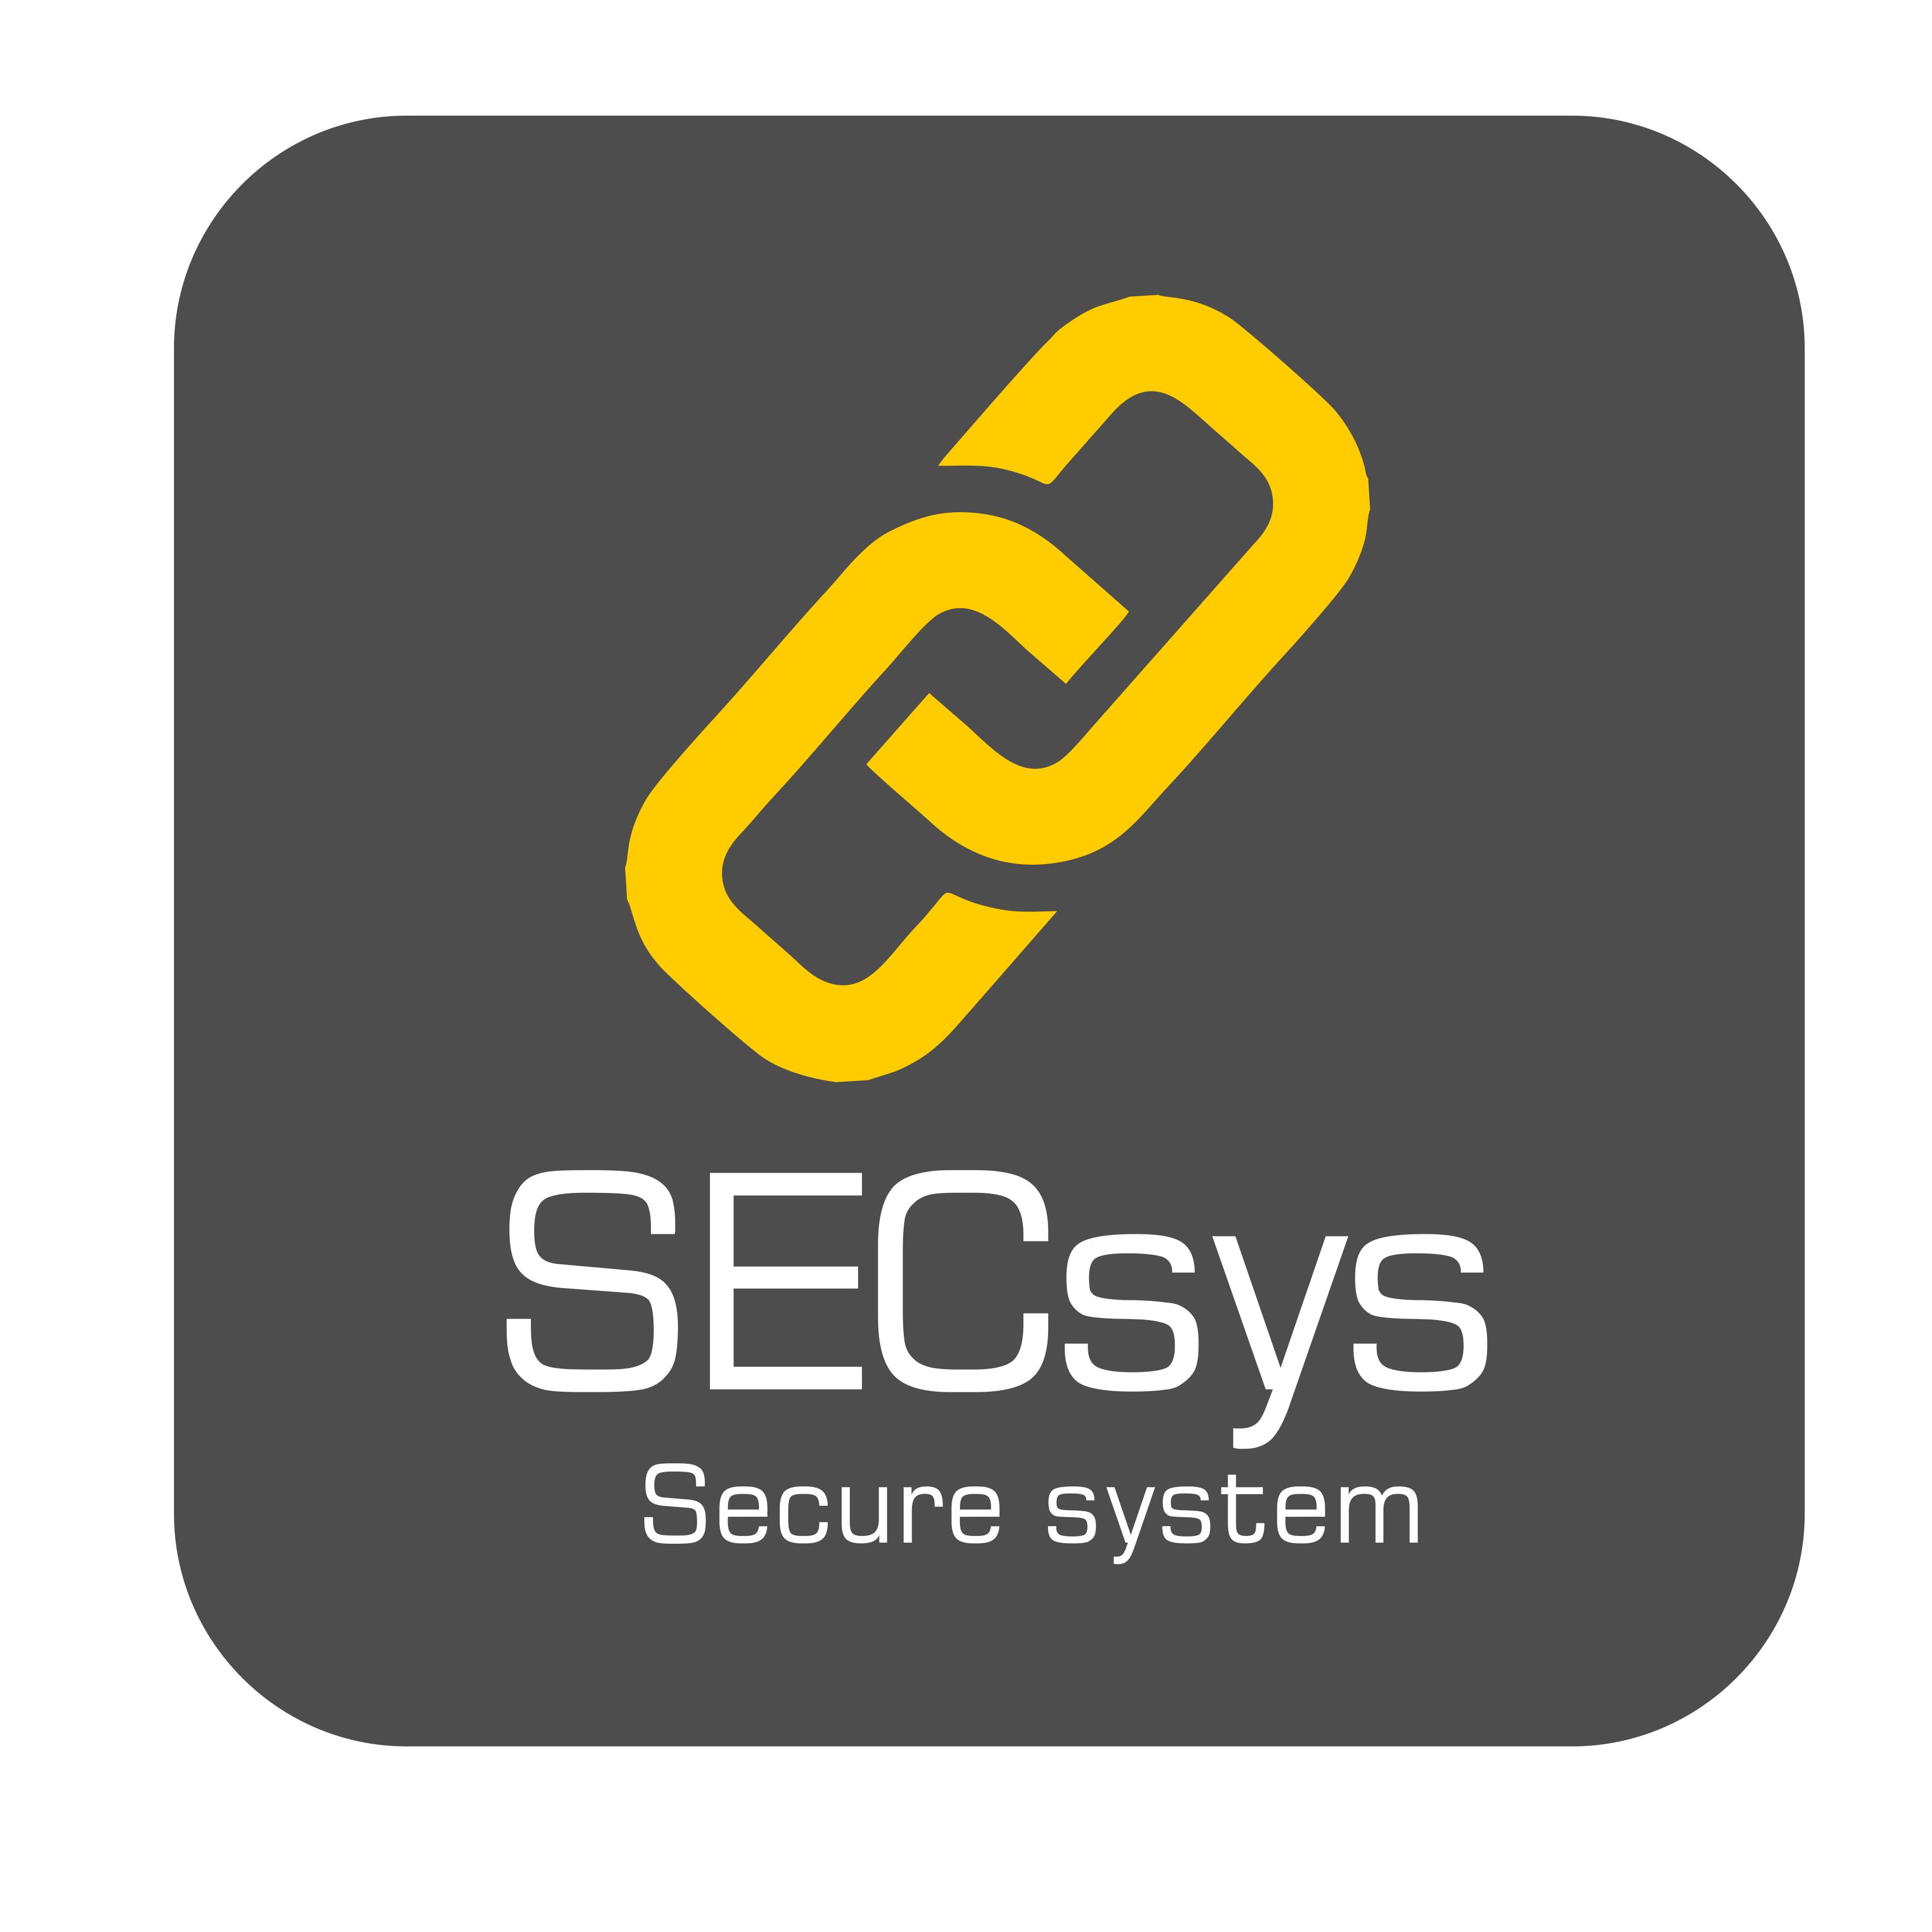 SECsys